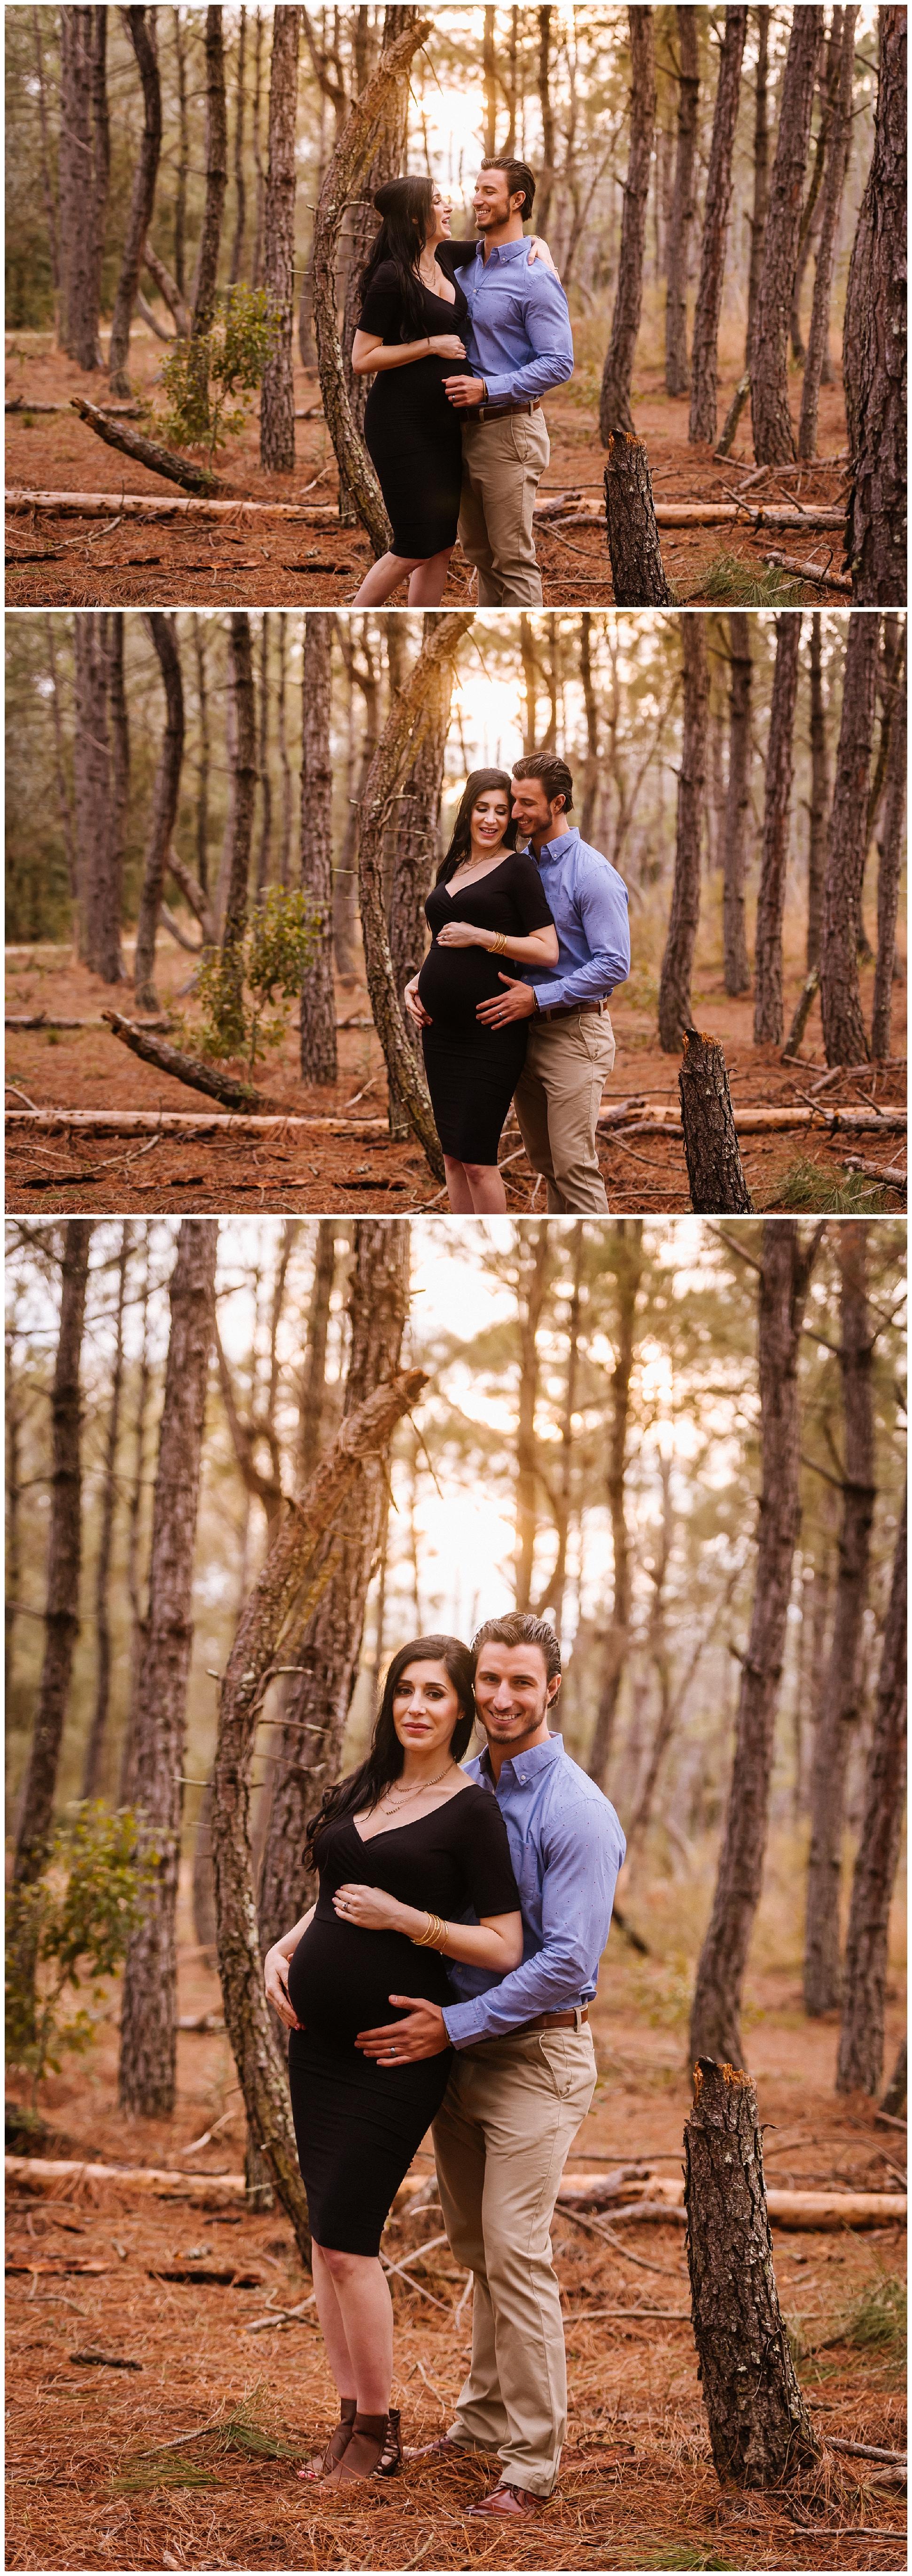 Tampa-maternity-photographer-morris-bridge-park-hip-tight-black-dress-woods_0013.jpg